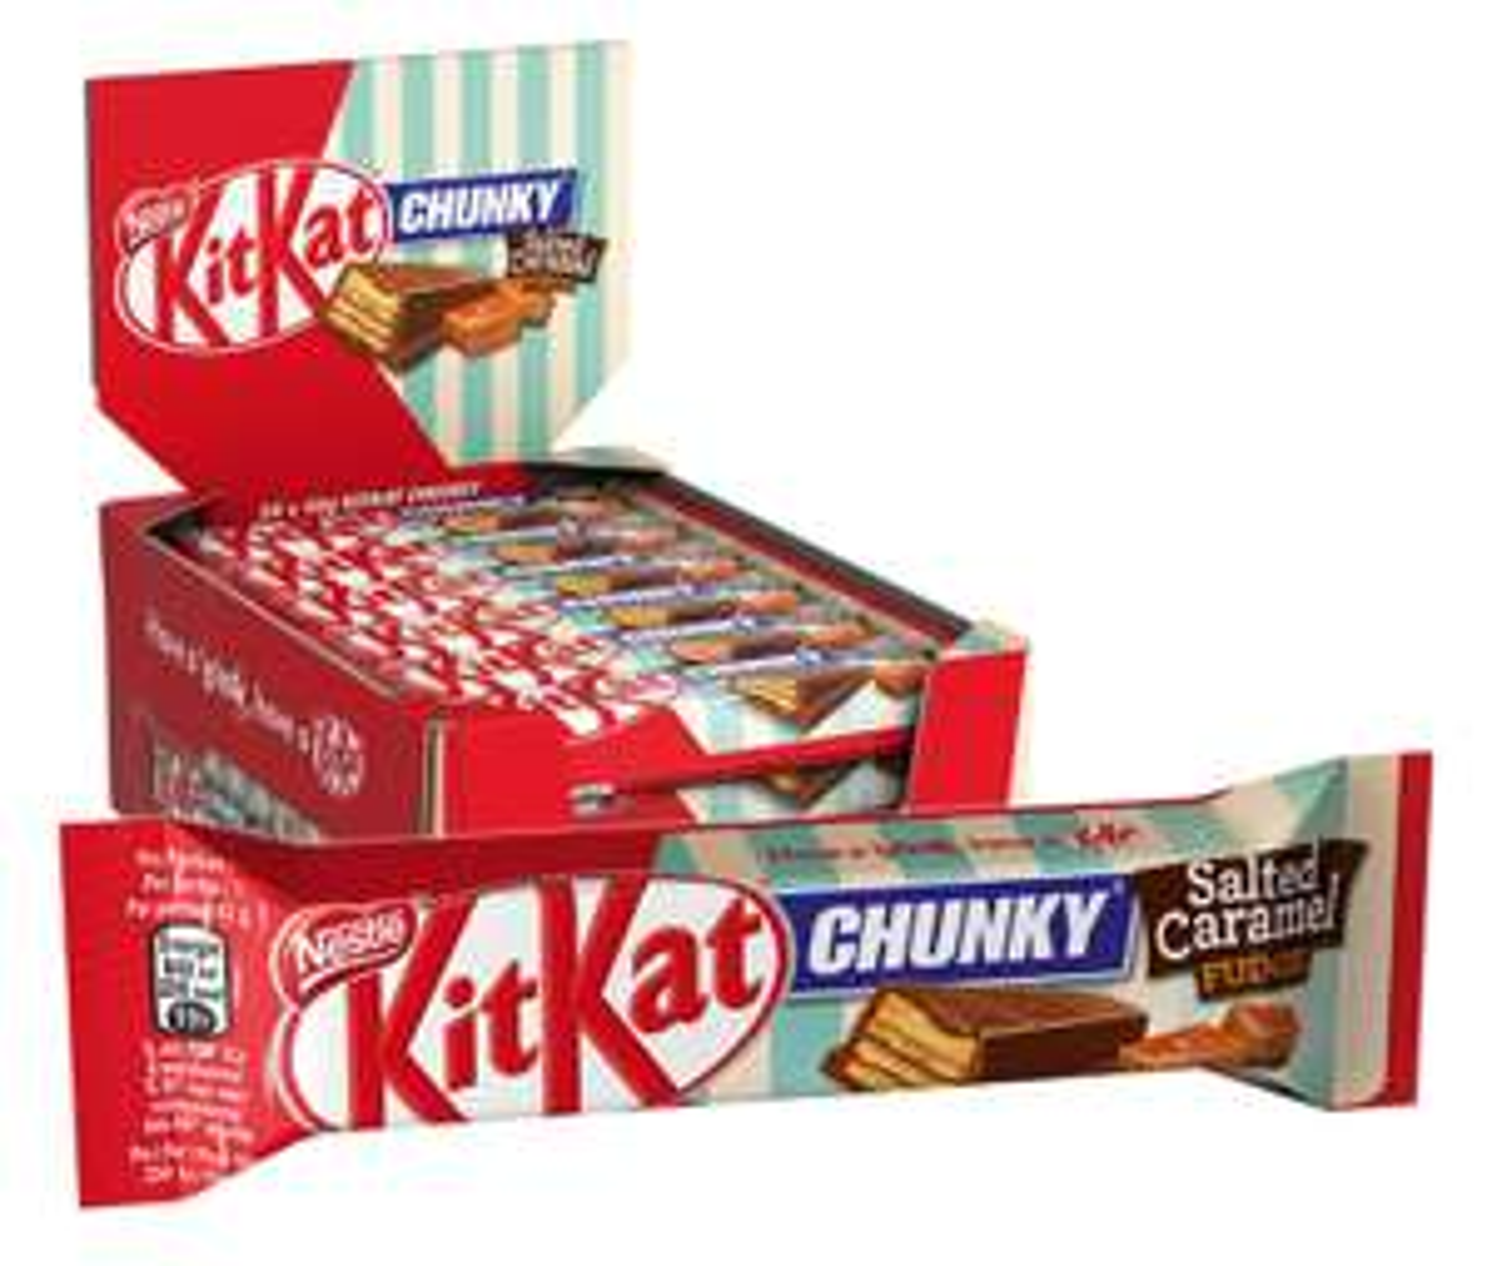 24x KitKat Chunky Salted Caramel Fudge